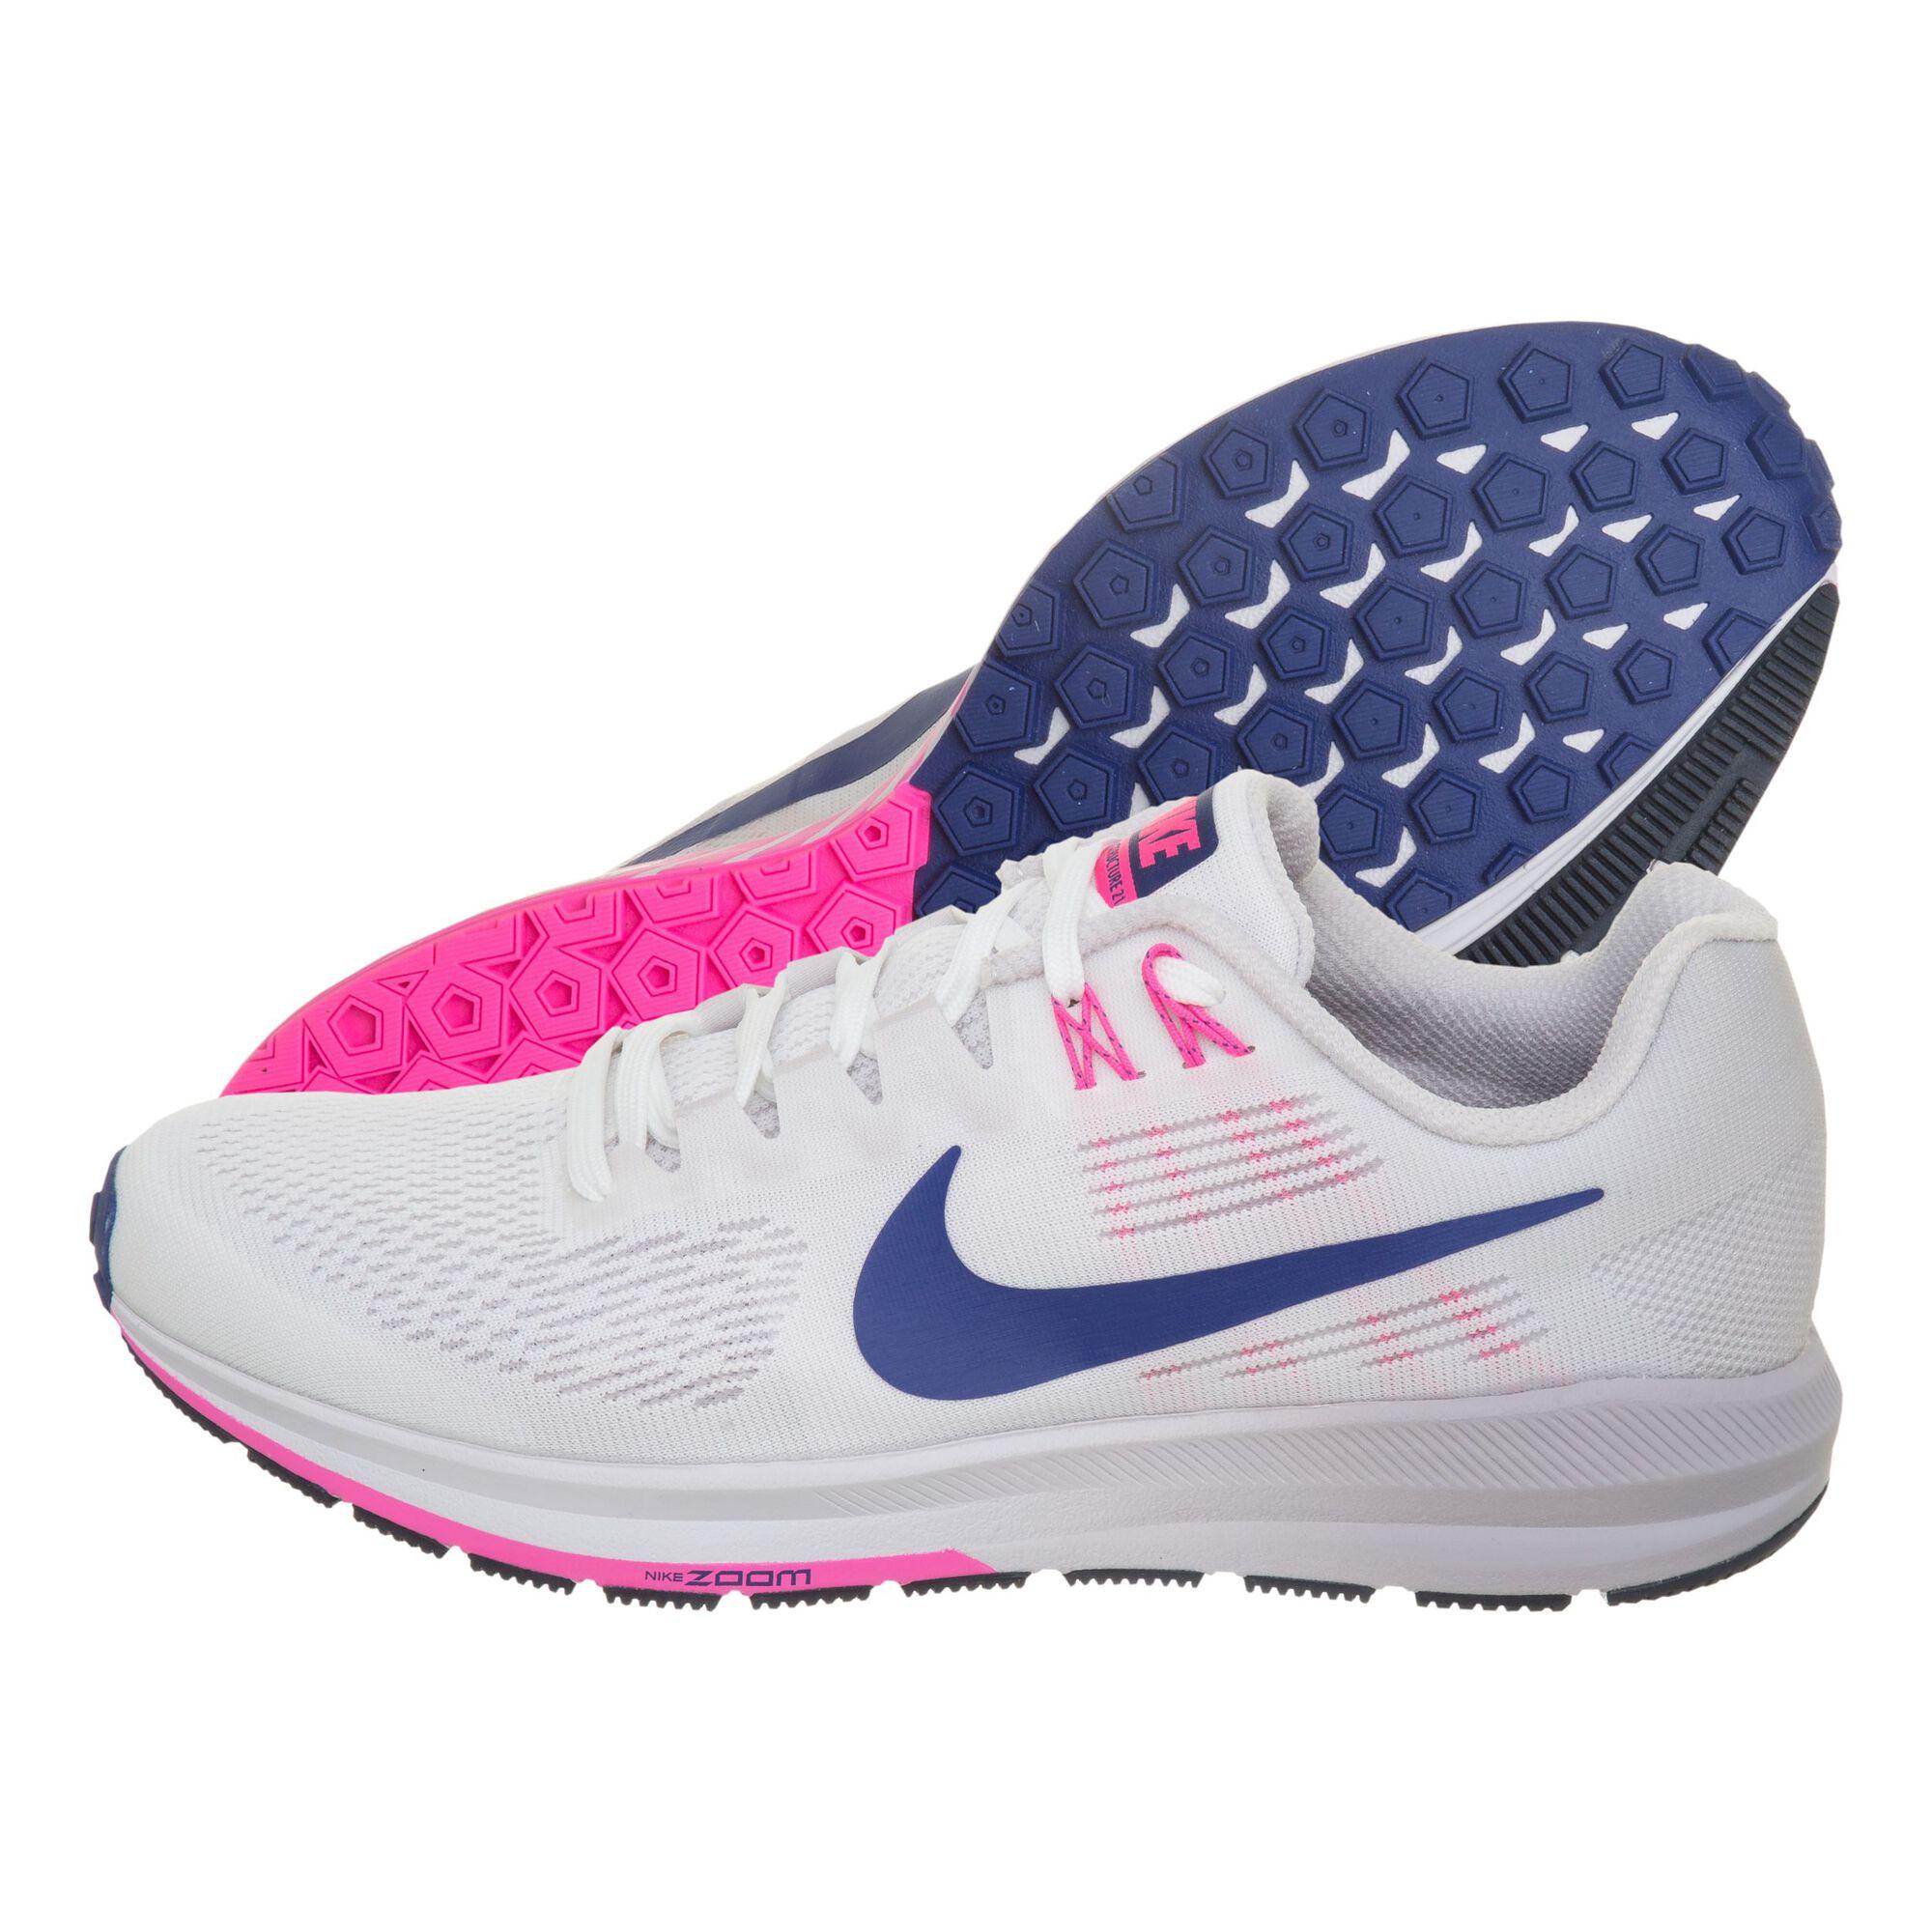 ebf3f2bf49e68d buy Nike Air Zoom Structure 21 Stability Running Shoe Women - White ...